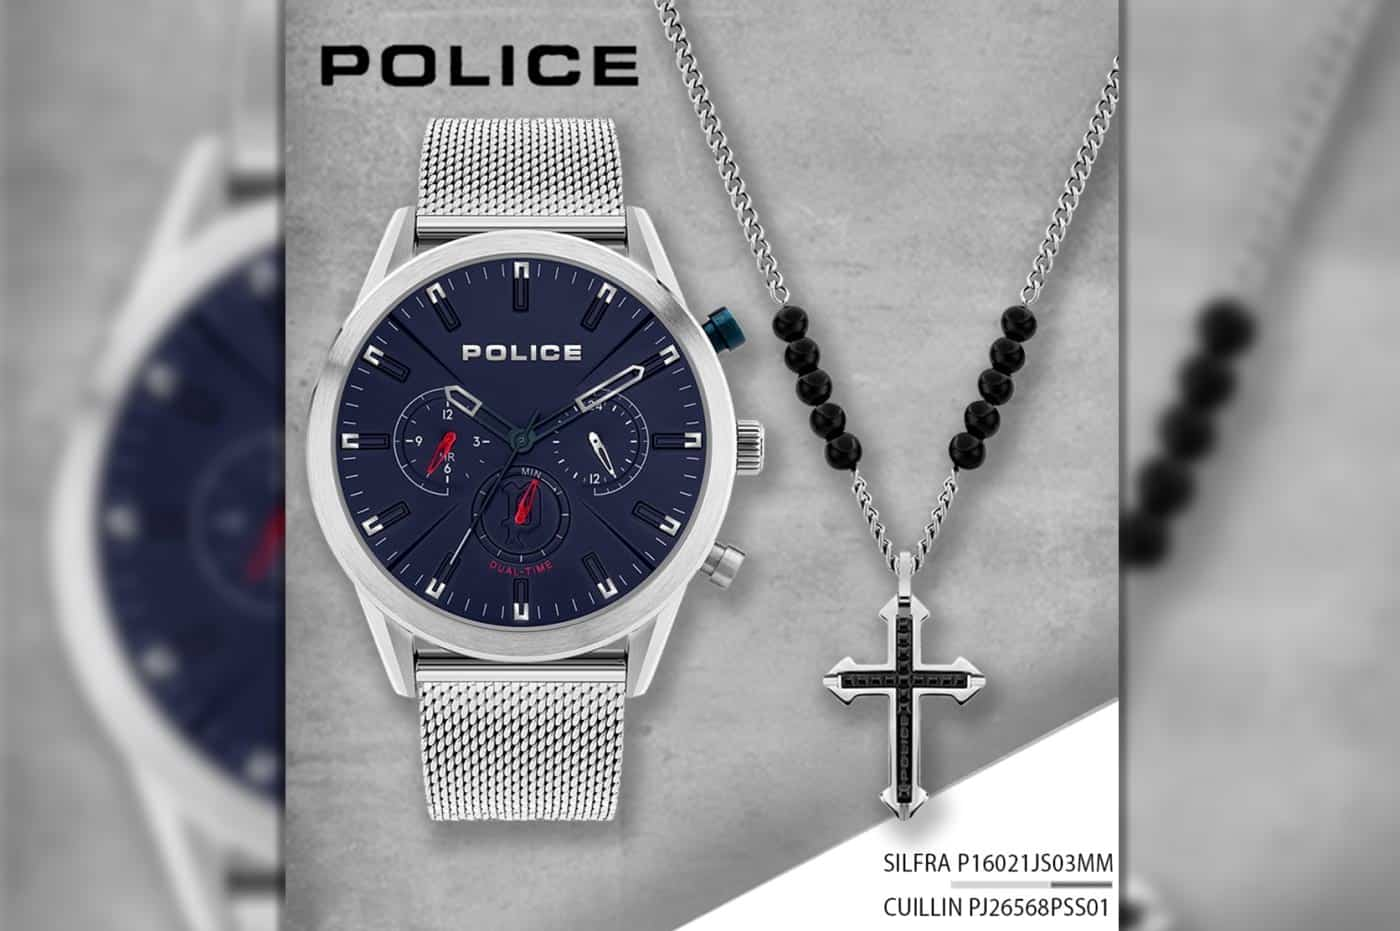 Police Silfra